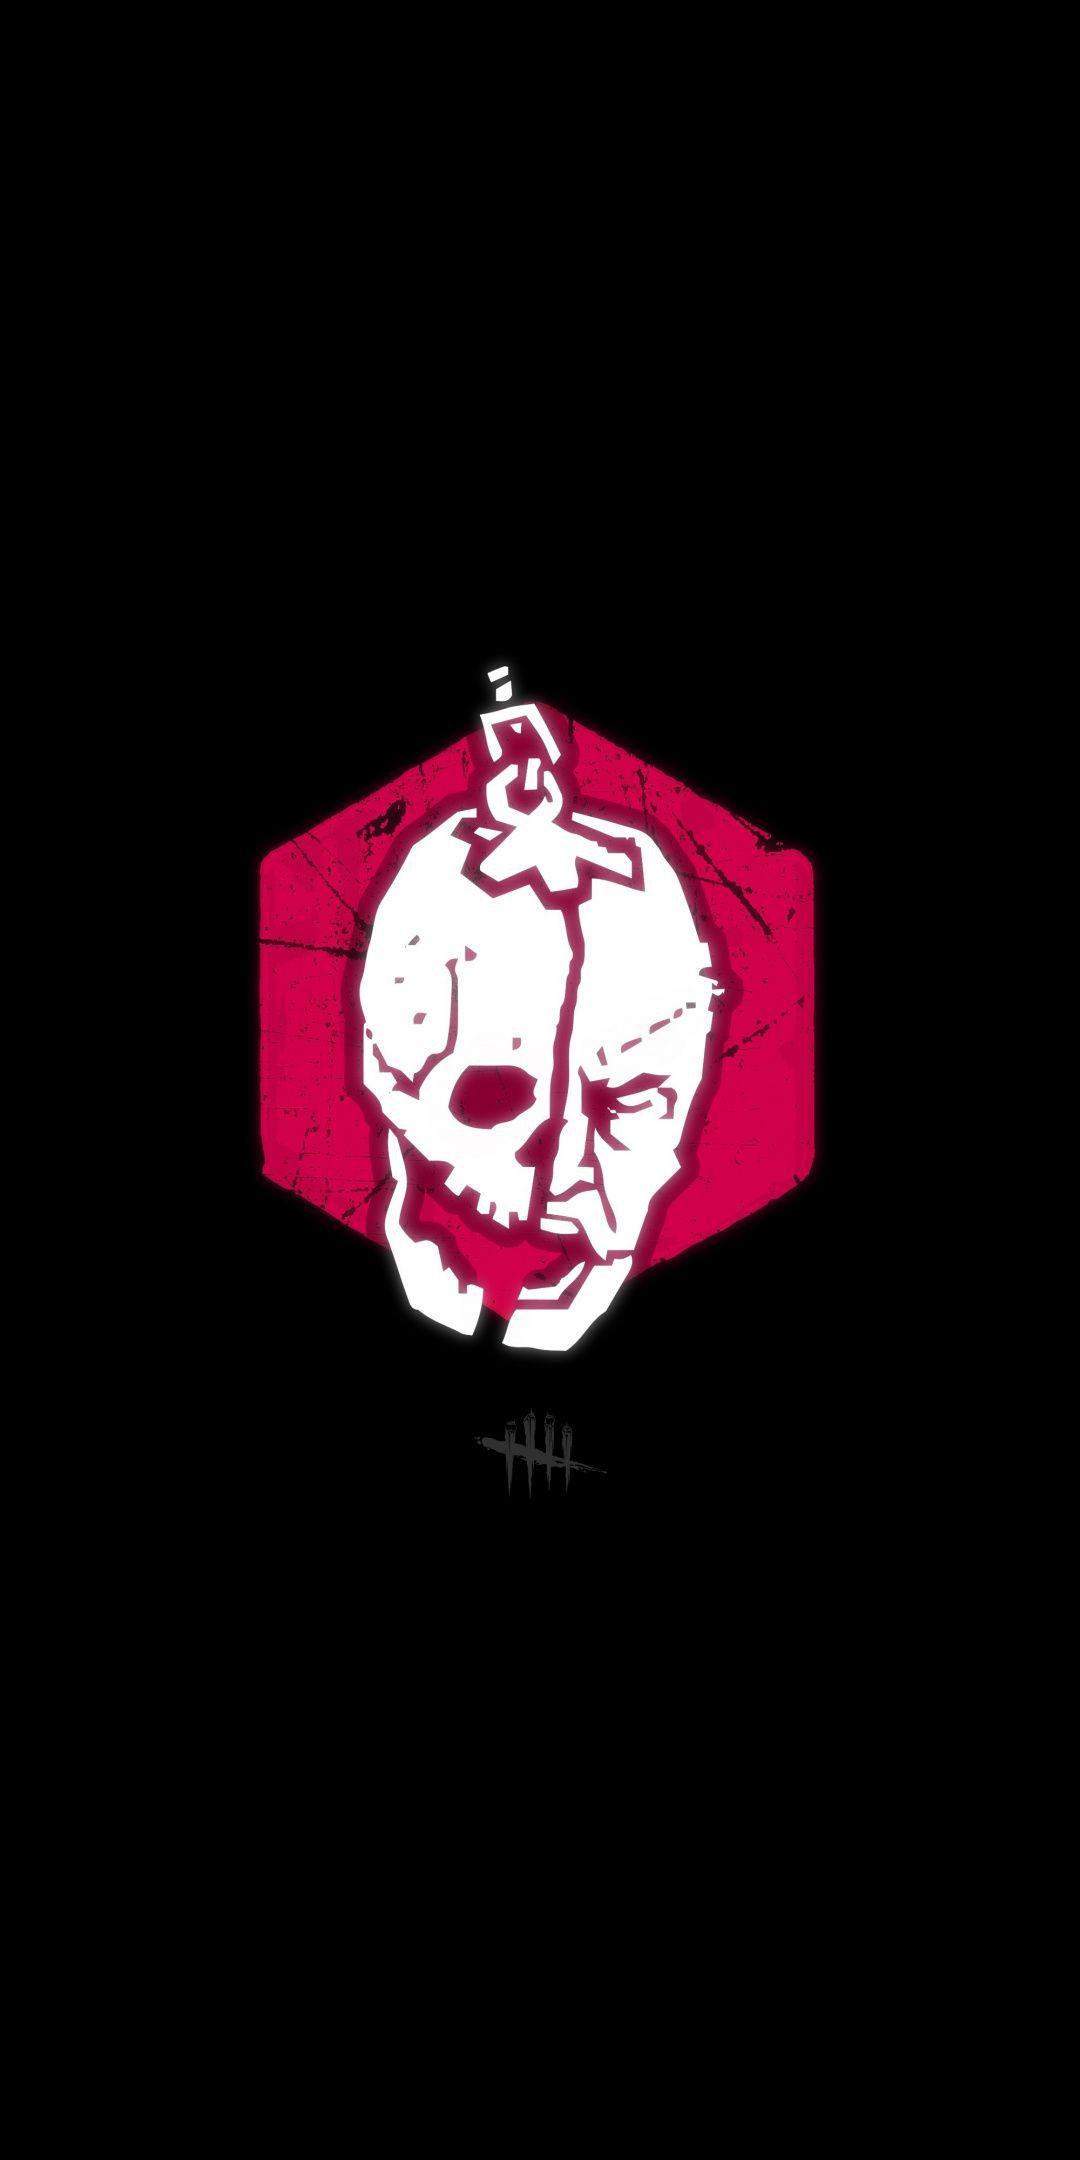 Skull Video Game Minimal Dead By Daylight 1080x2160 Wallpaper Army Wallpaper Latest Hd Wallpapers Wallpaper